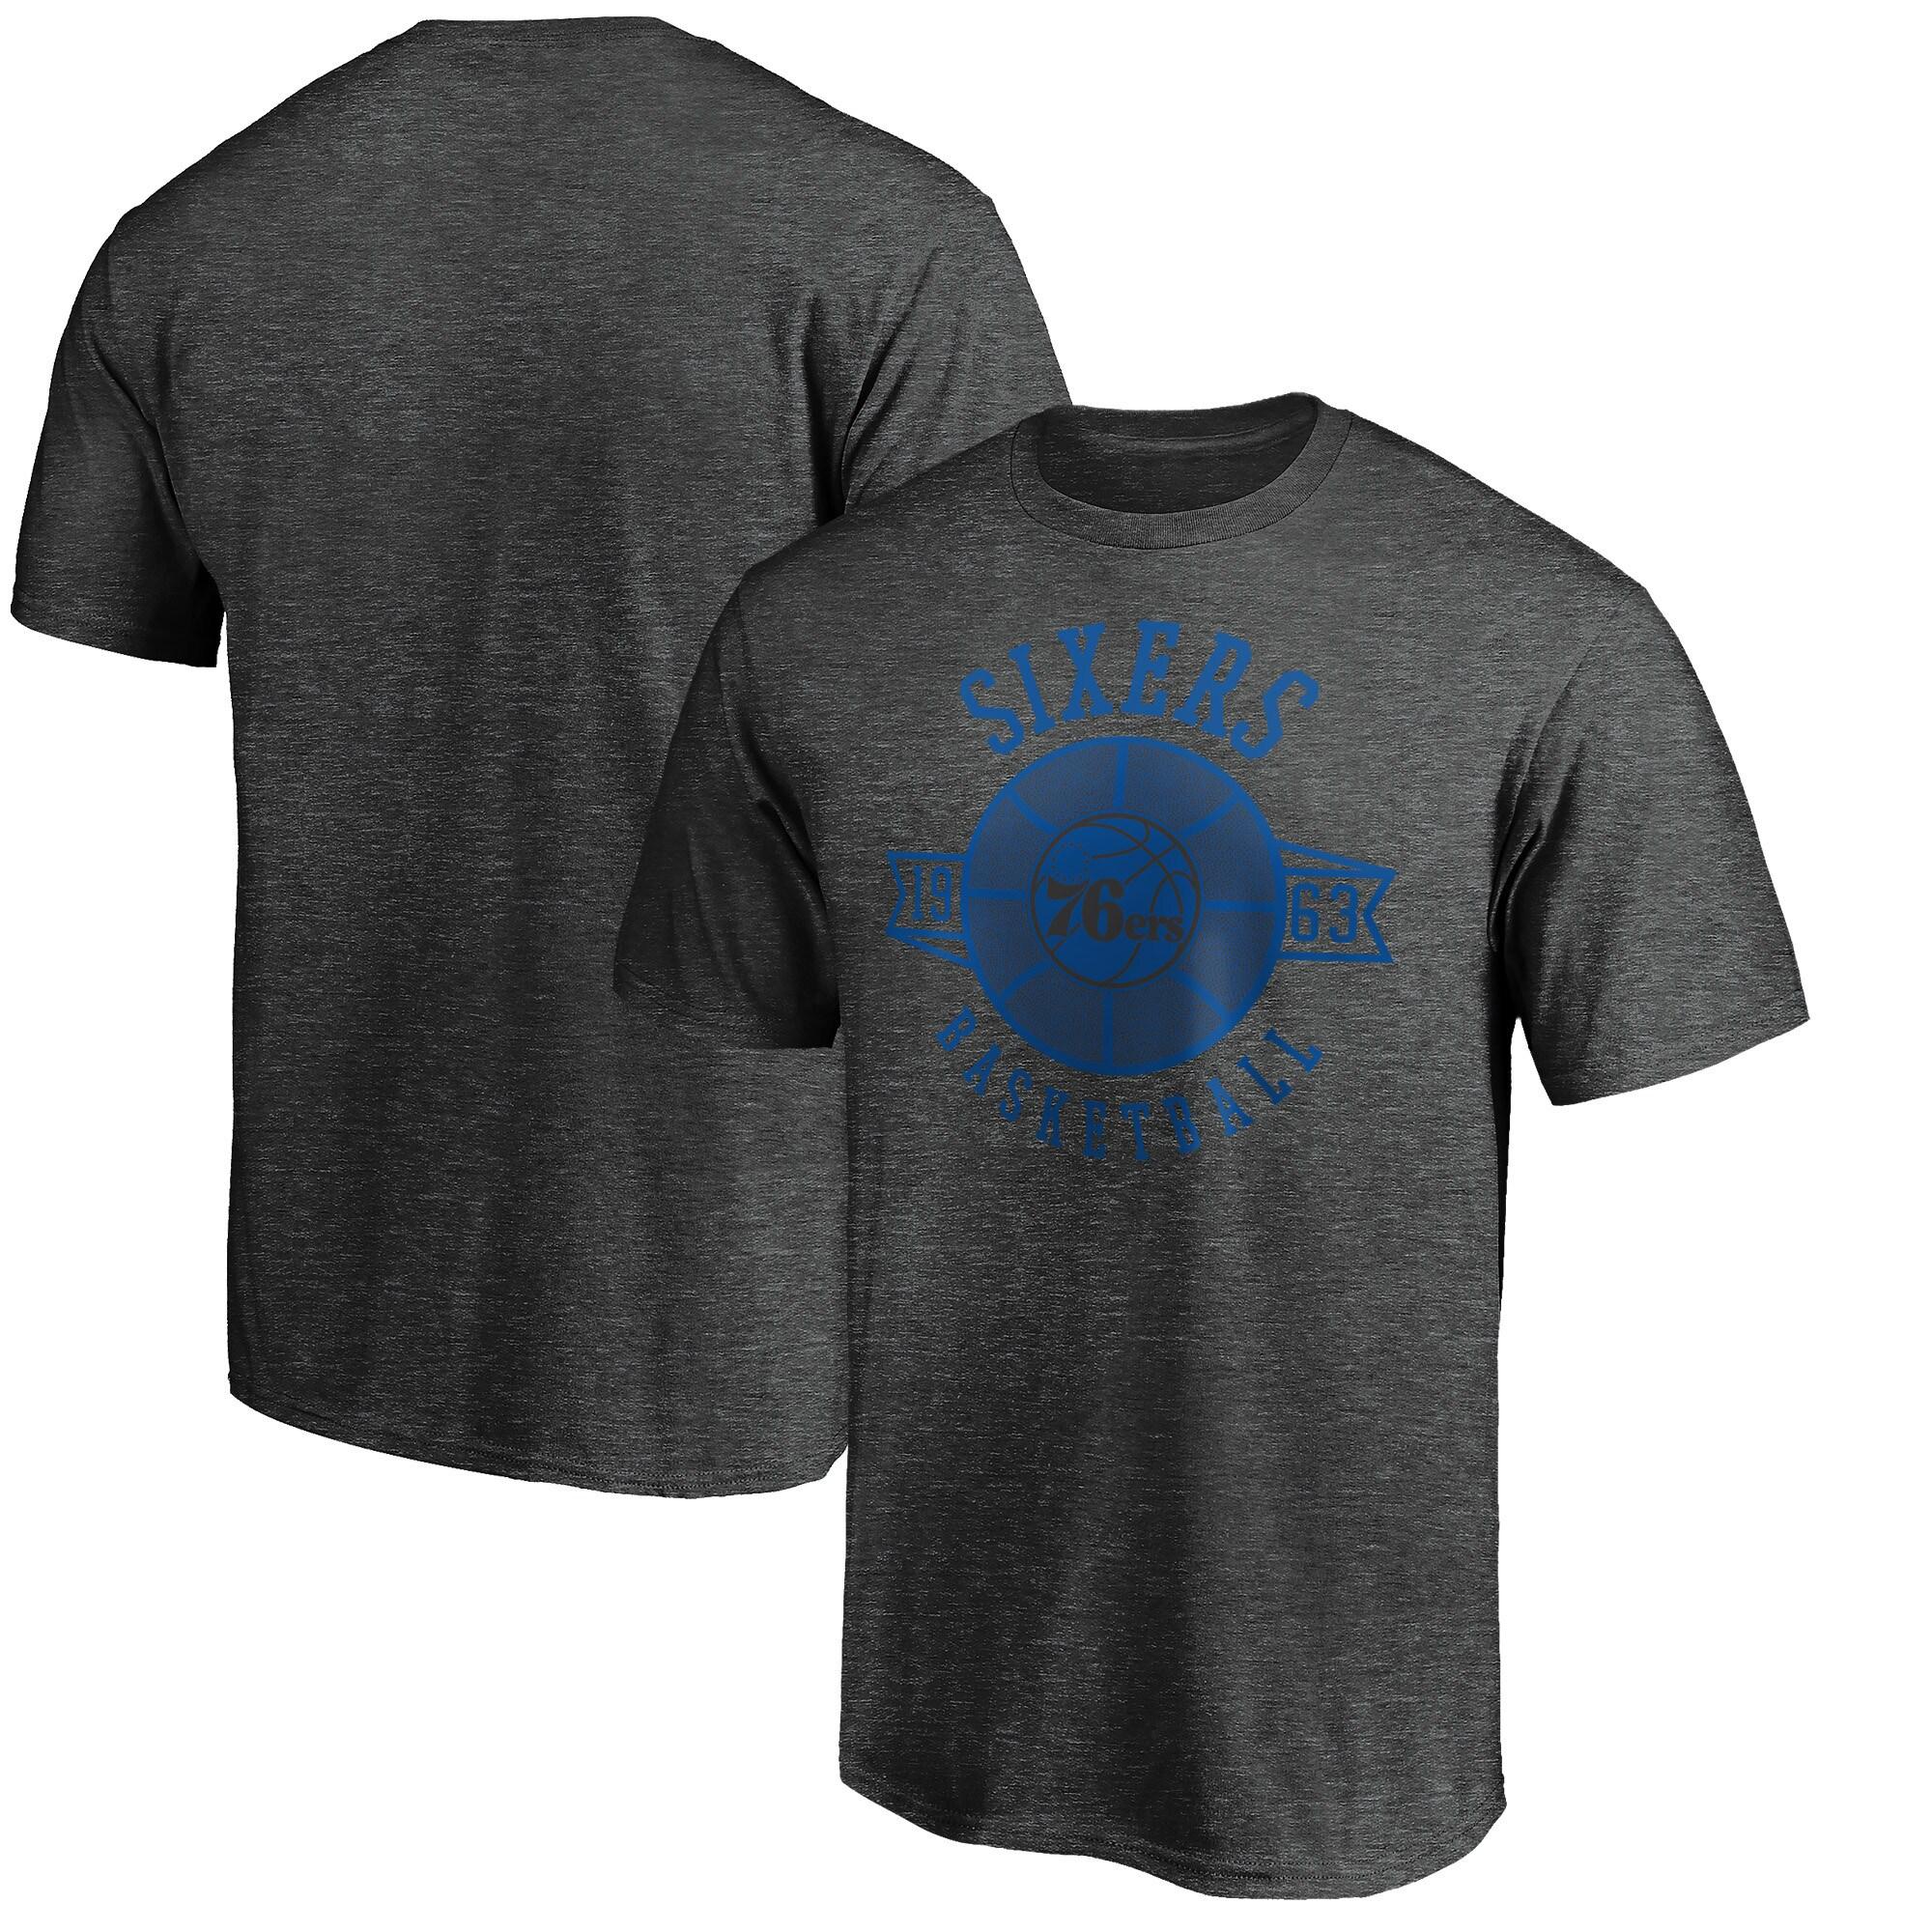 Philadelphia 76ers Fanatics Branded Showtime International Foul T-Shirt - Heathered Charcoal